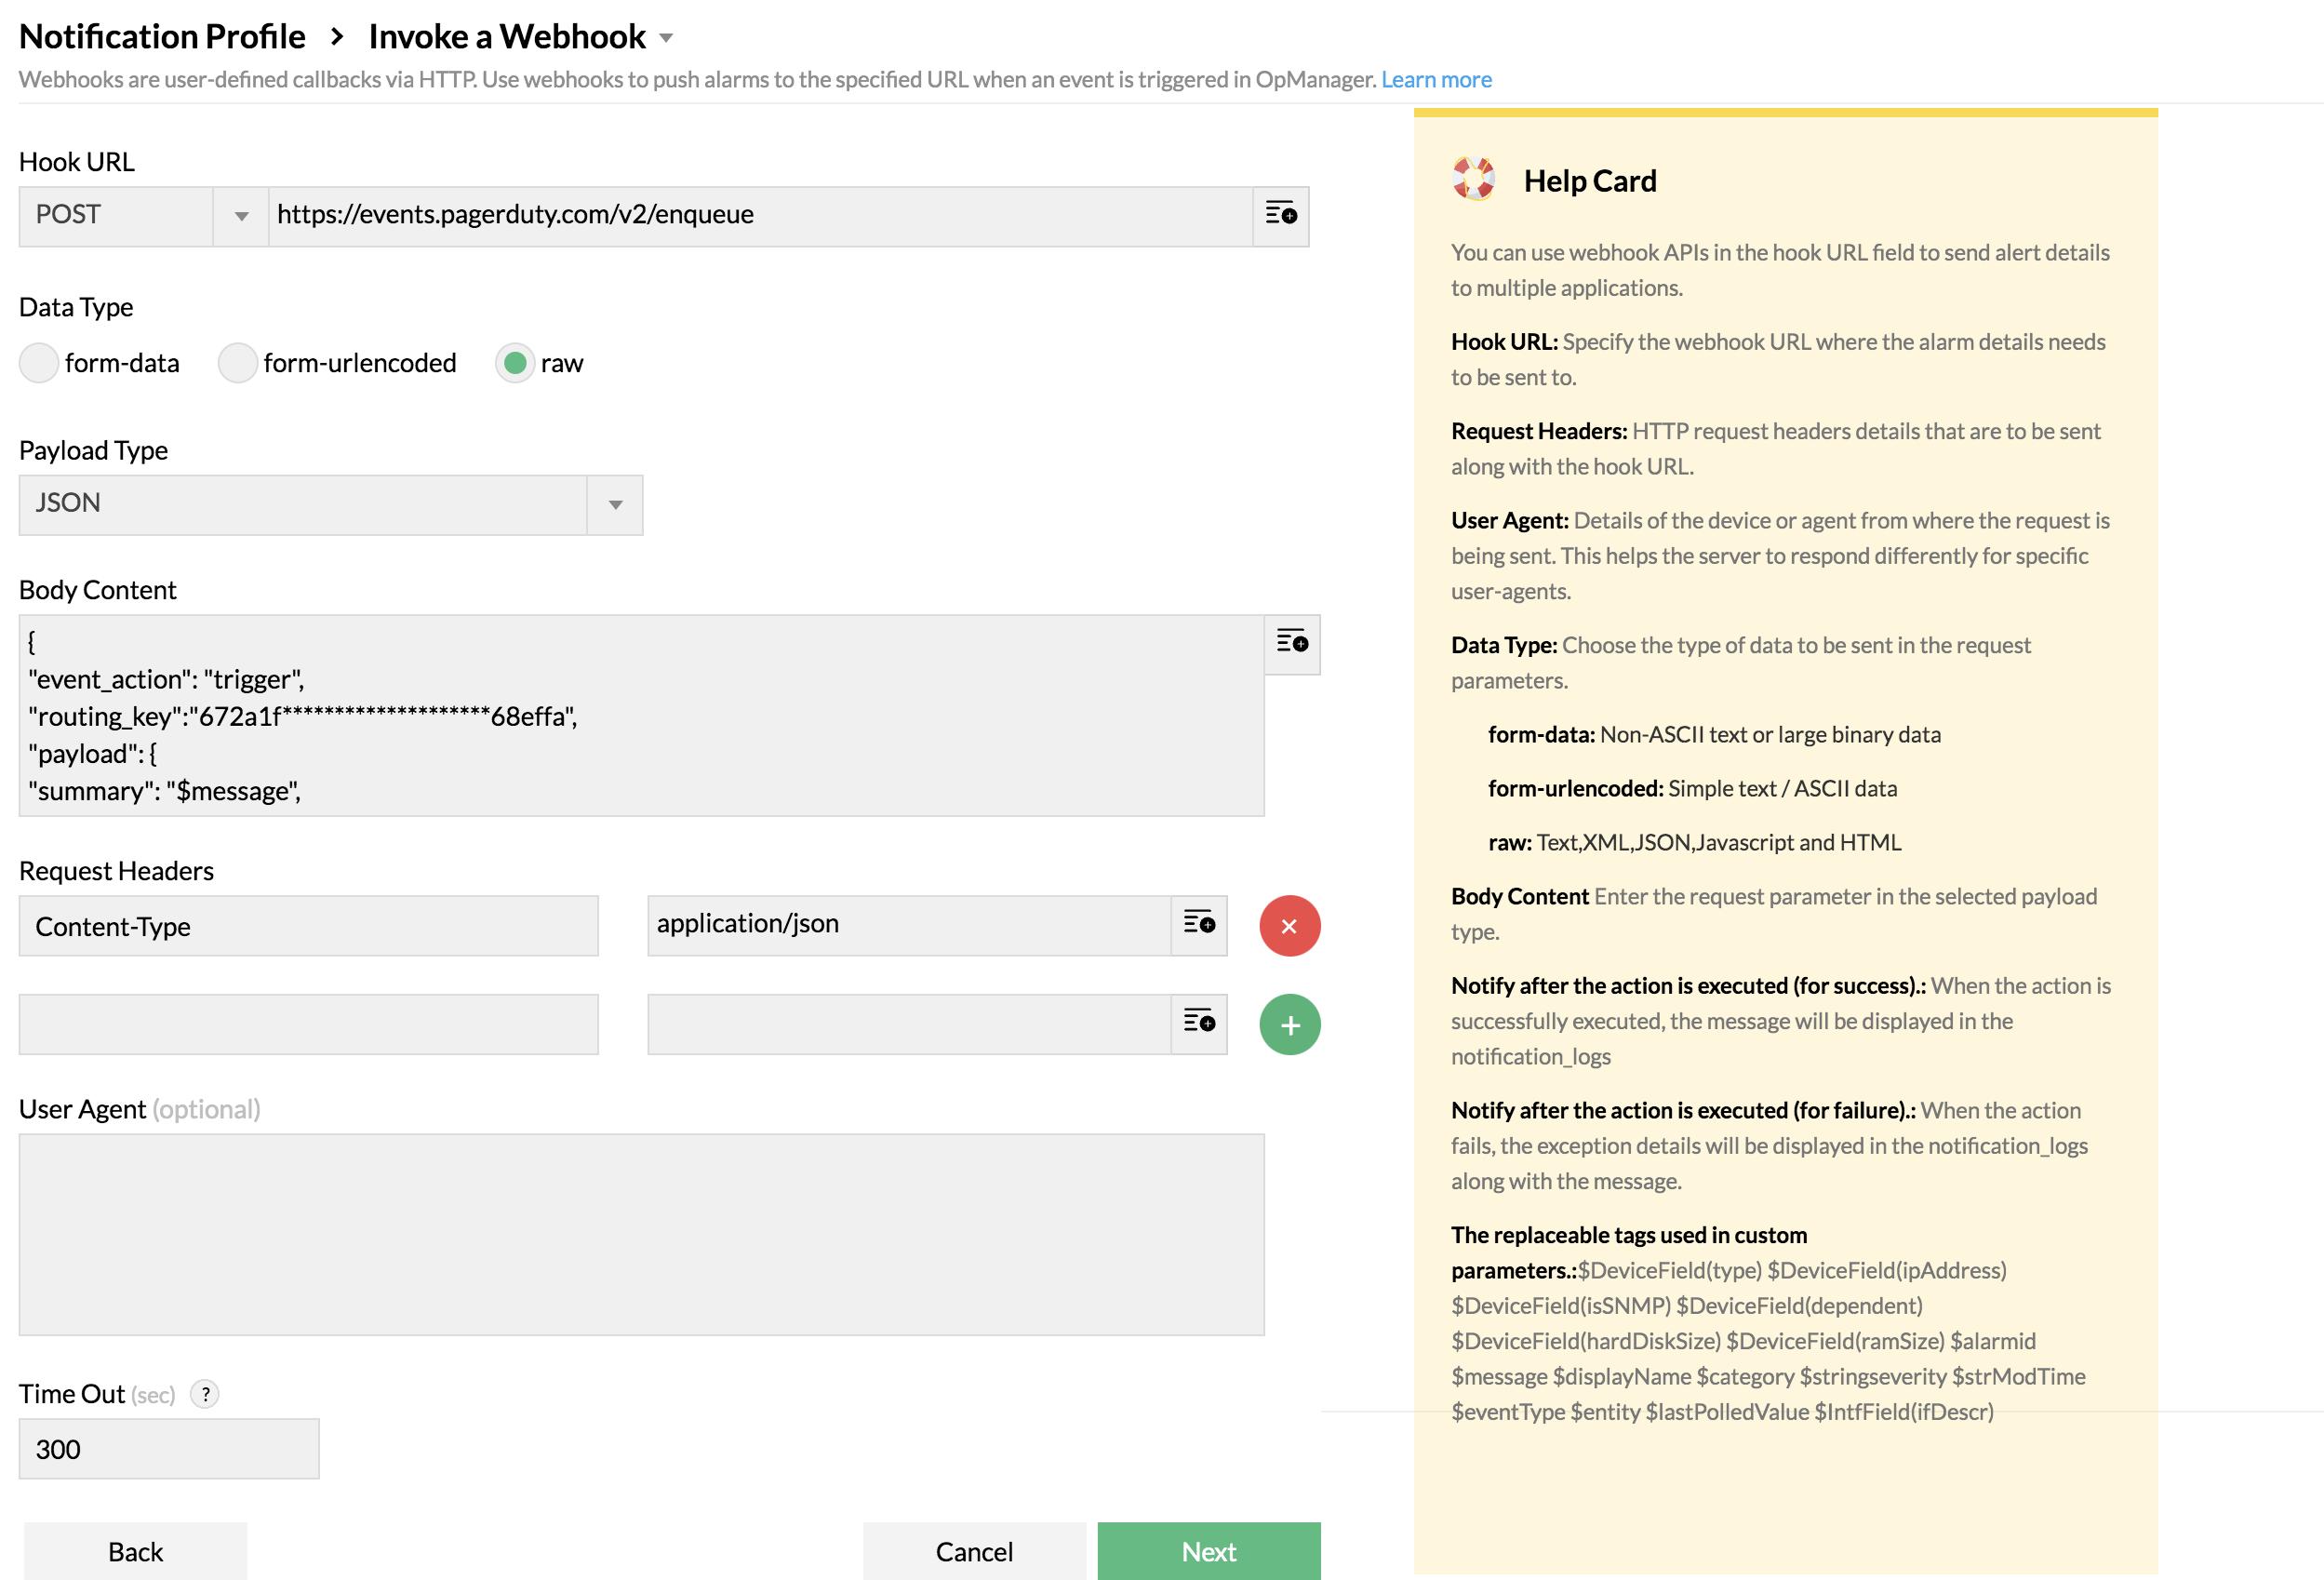 opmanager-pagerduty-integration-webhook